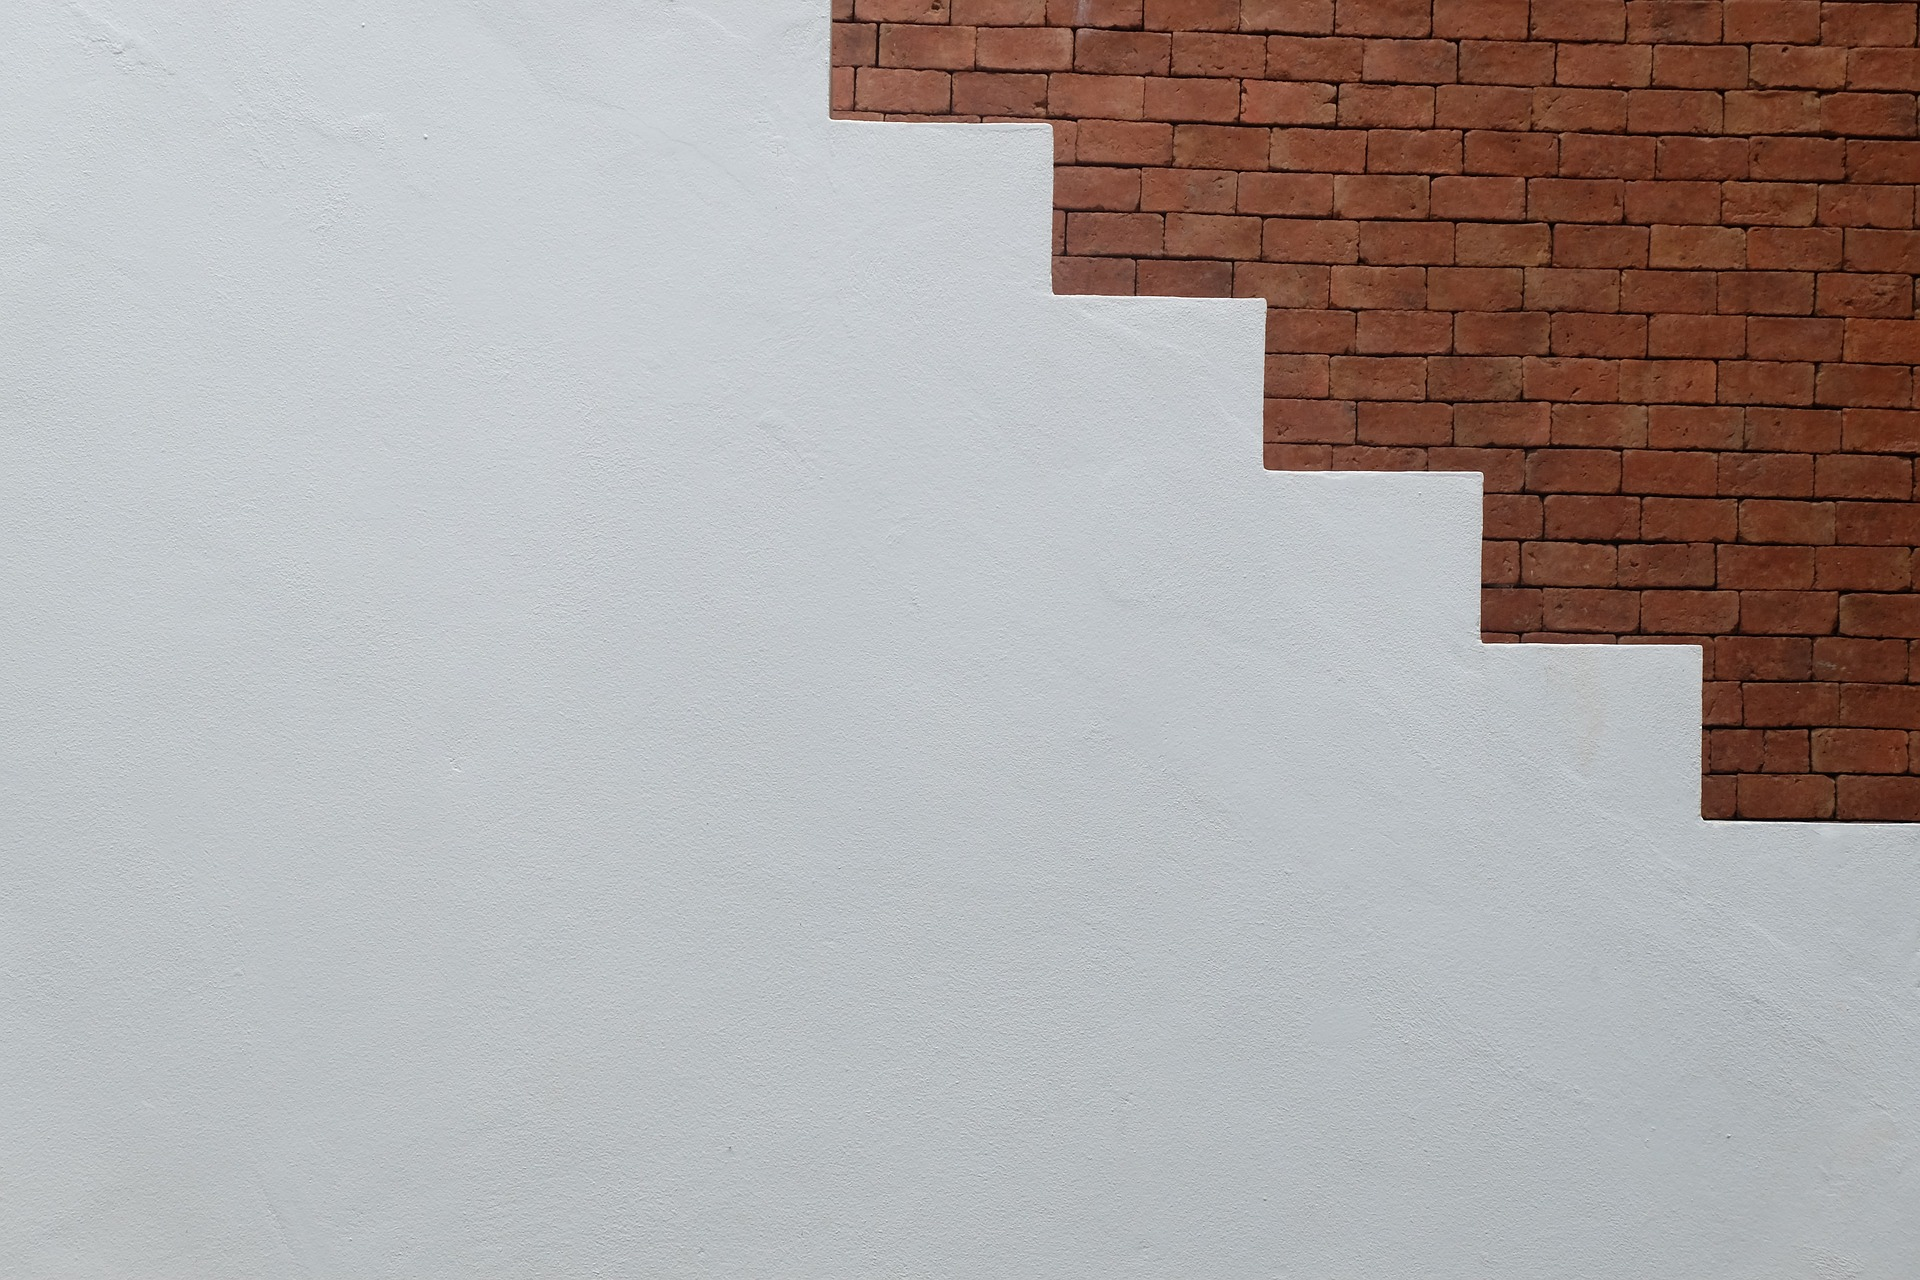 Concrete Stair Retrofit